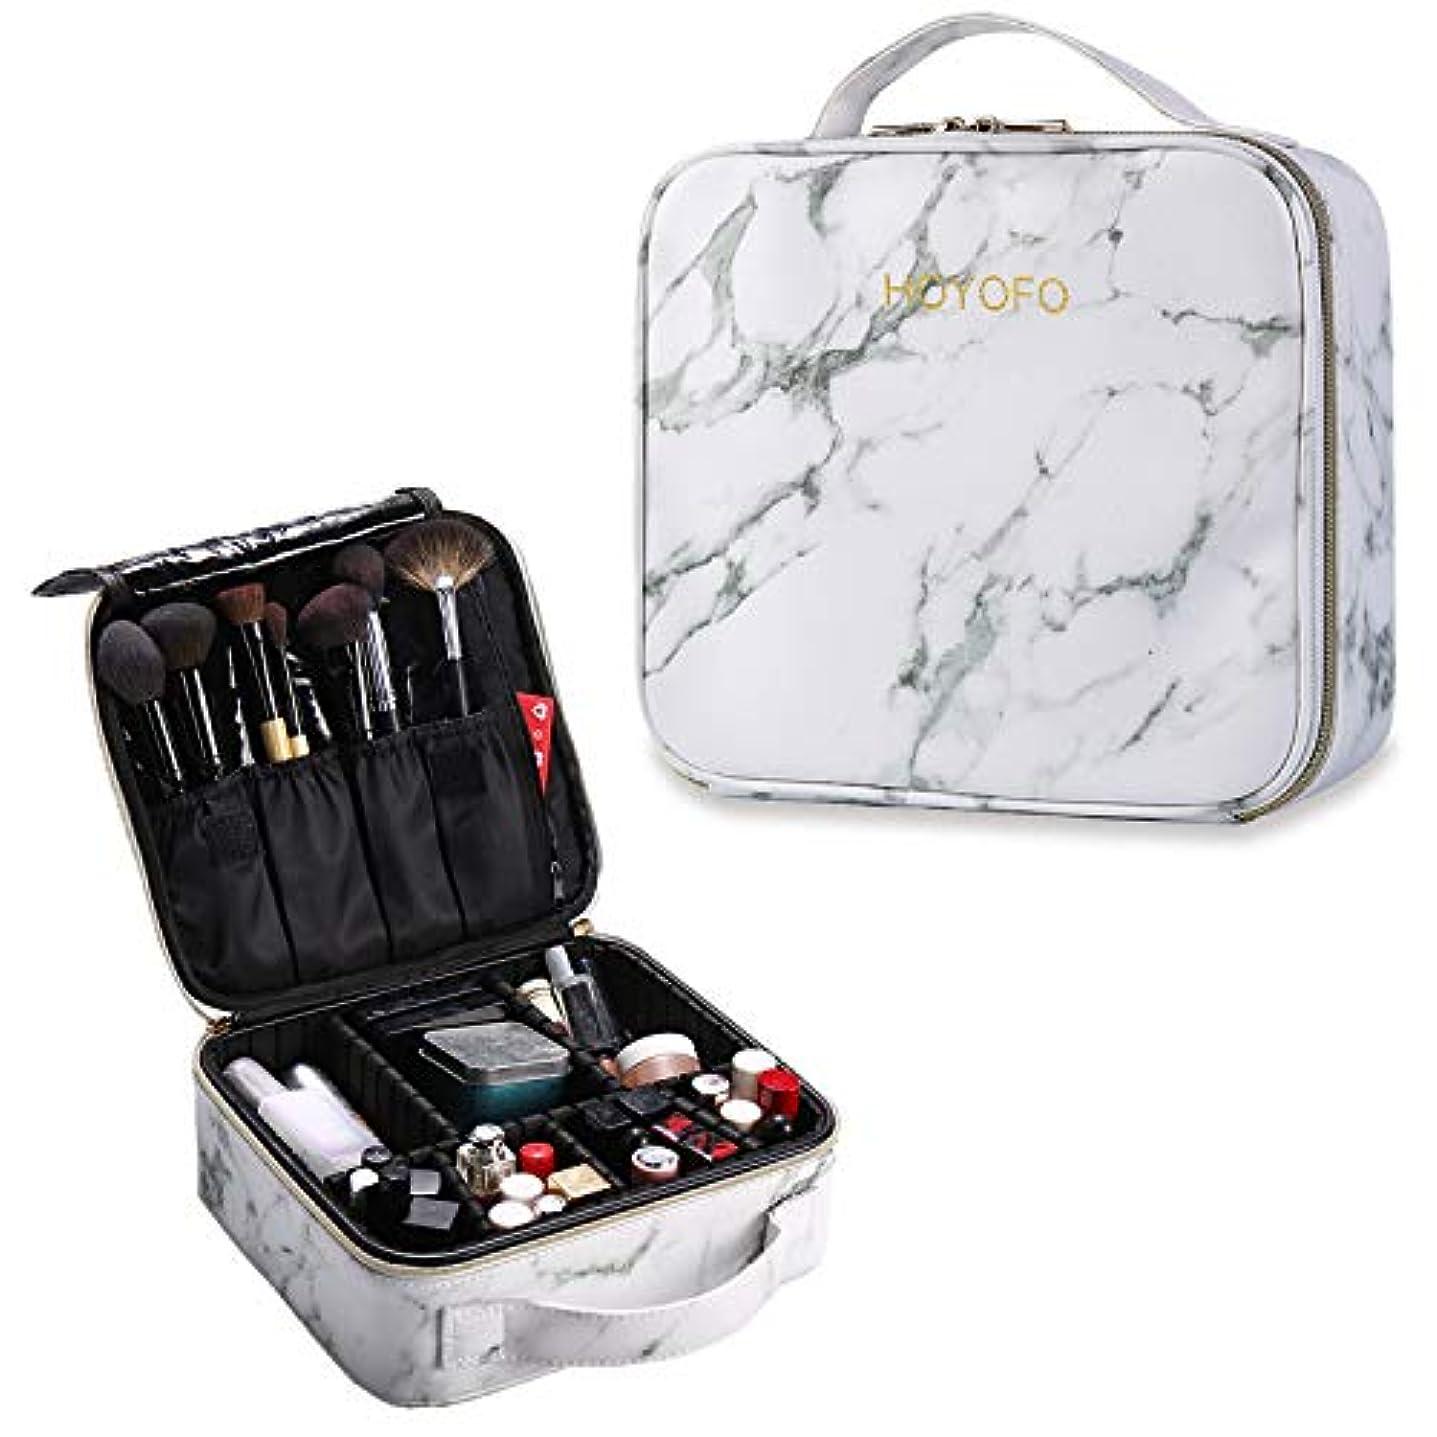 HOYOFO メイクボックス プロ用 大容量 機能的 コスメ収納 メイク 化粧道具 小物入れ おしゃれ 高級感 收納抜群 高品質 旅行 大理石柄 ホワイト